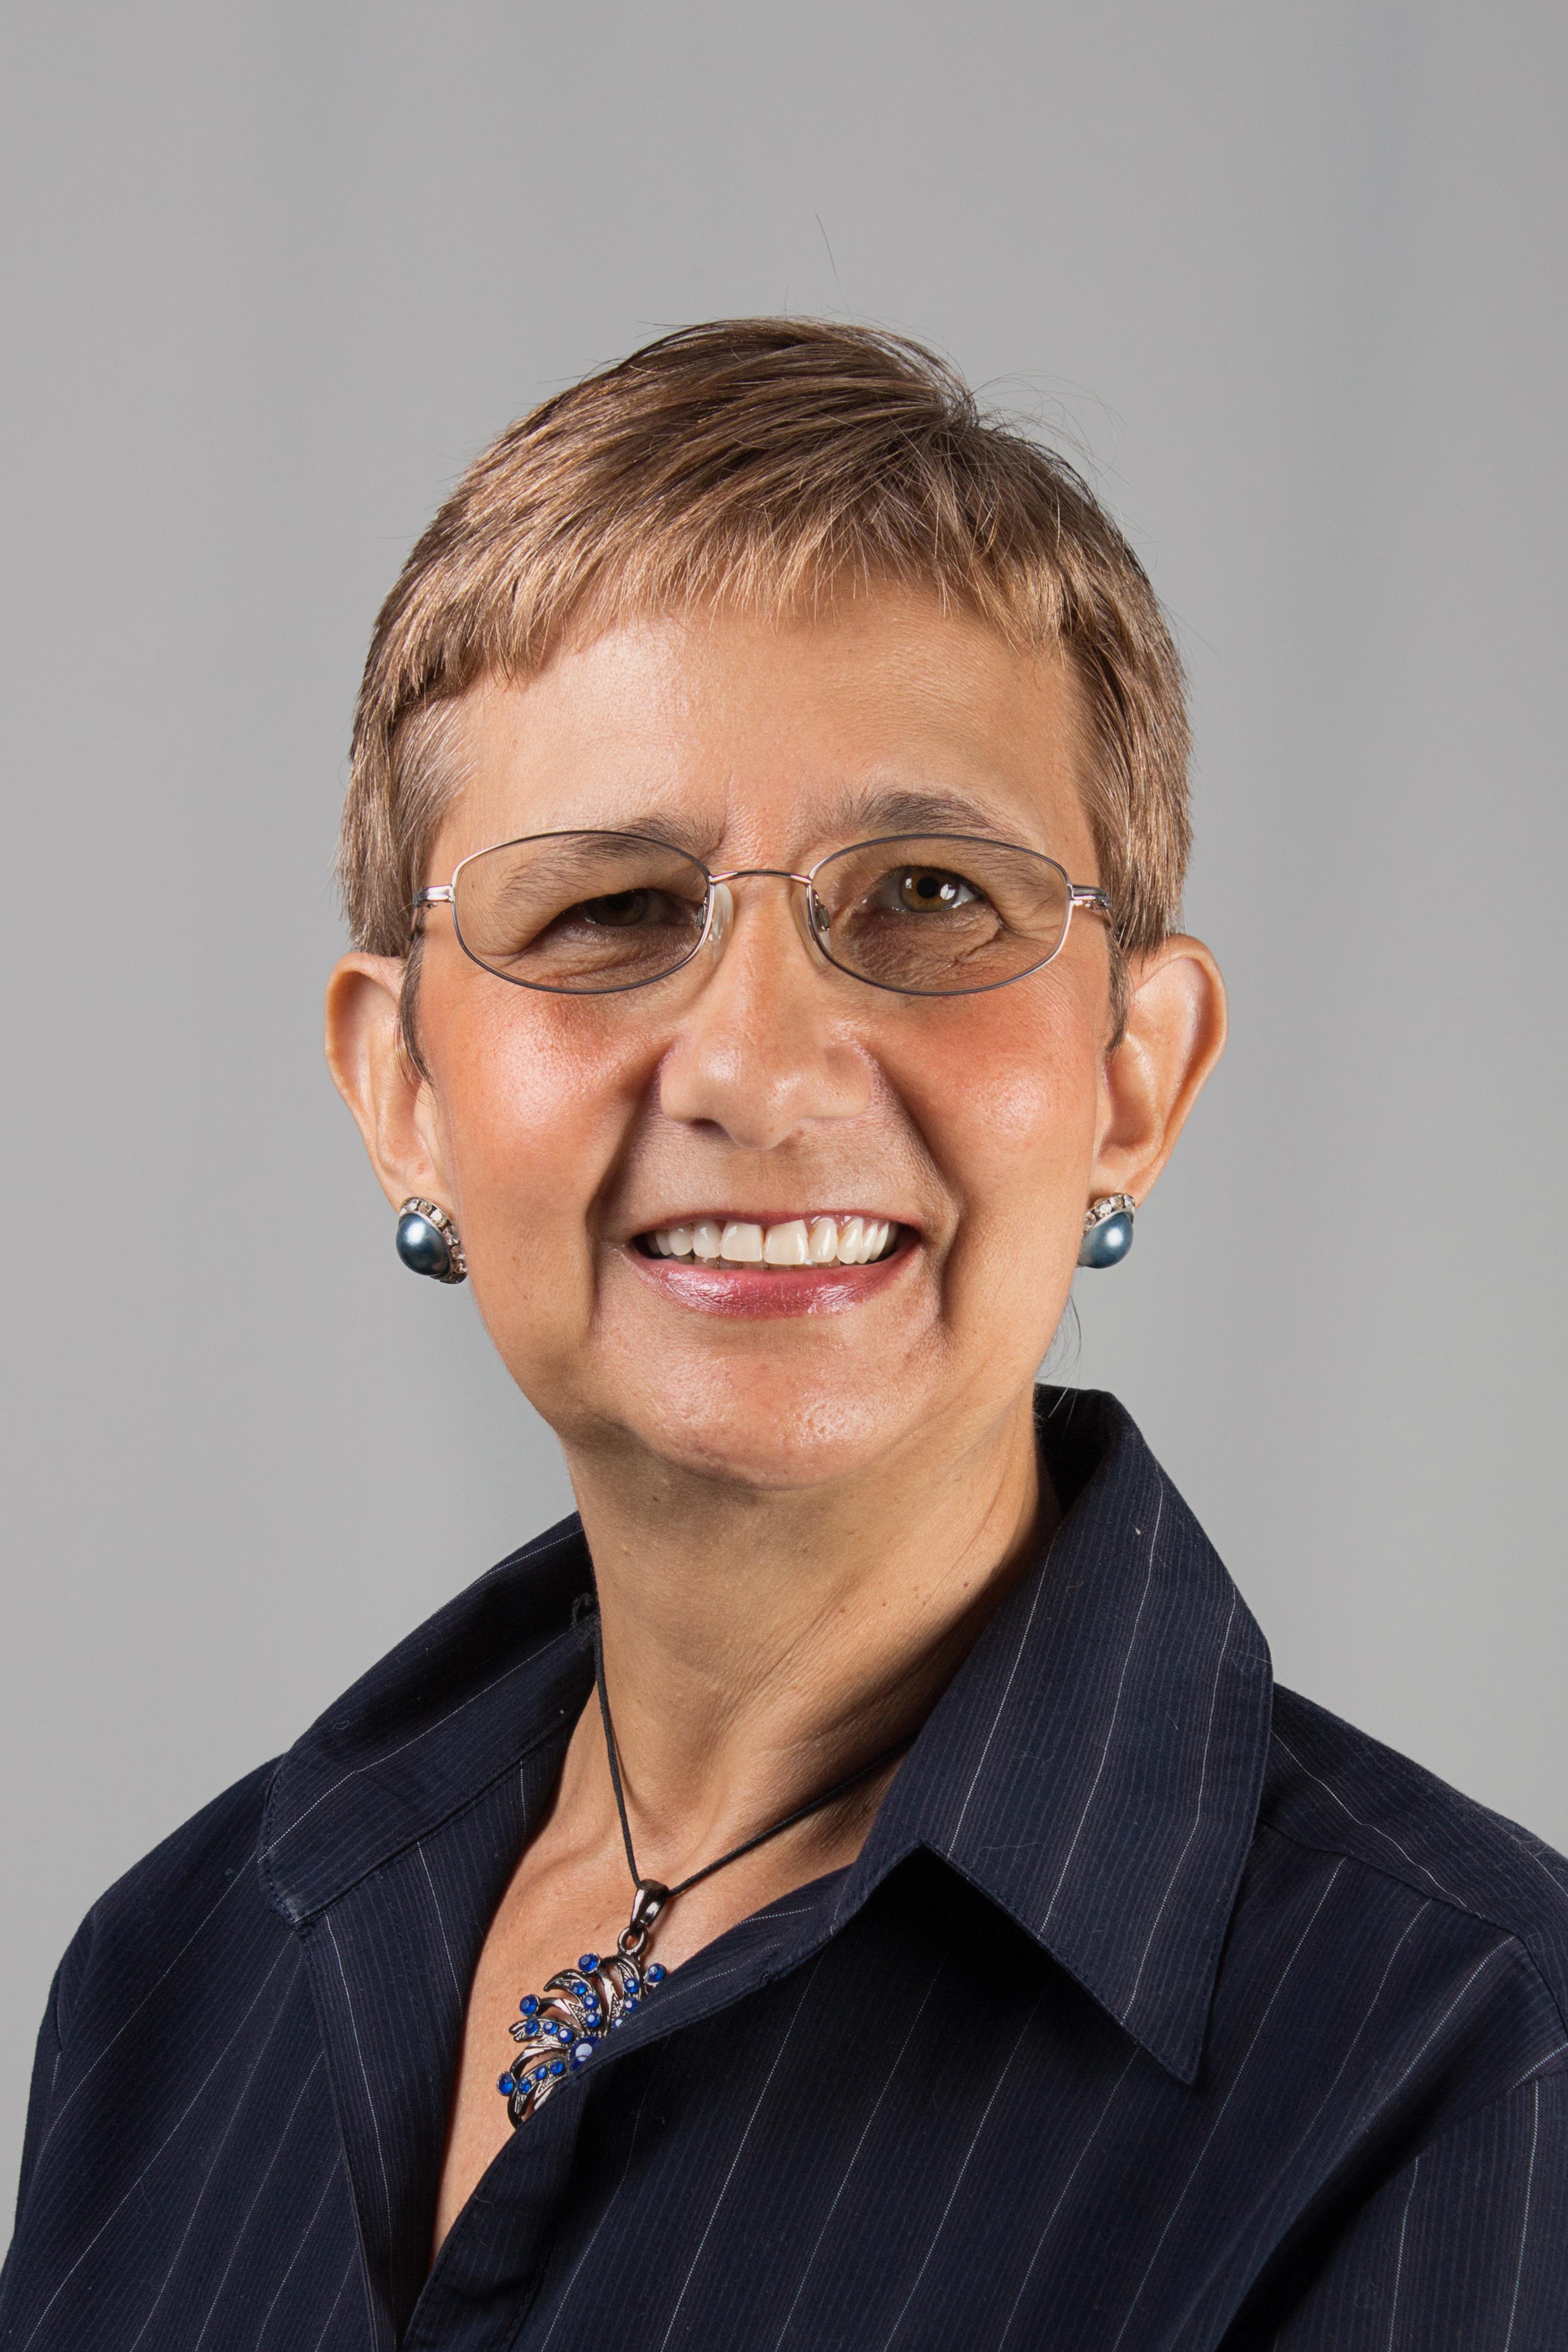 Magriet Gerber